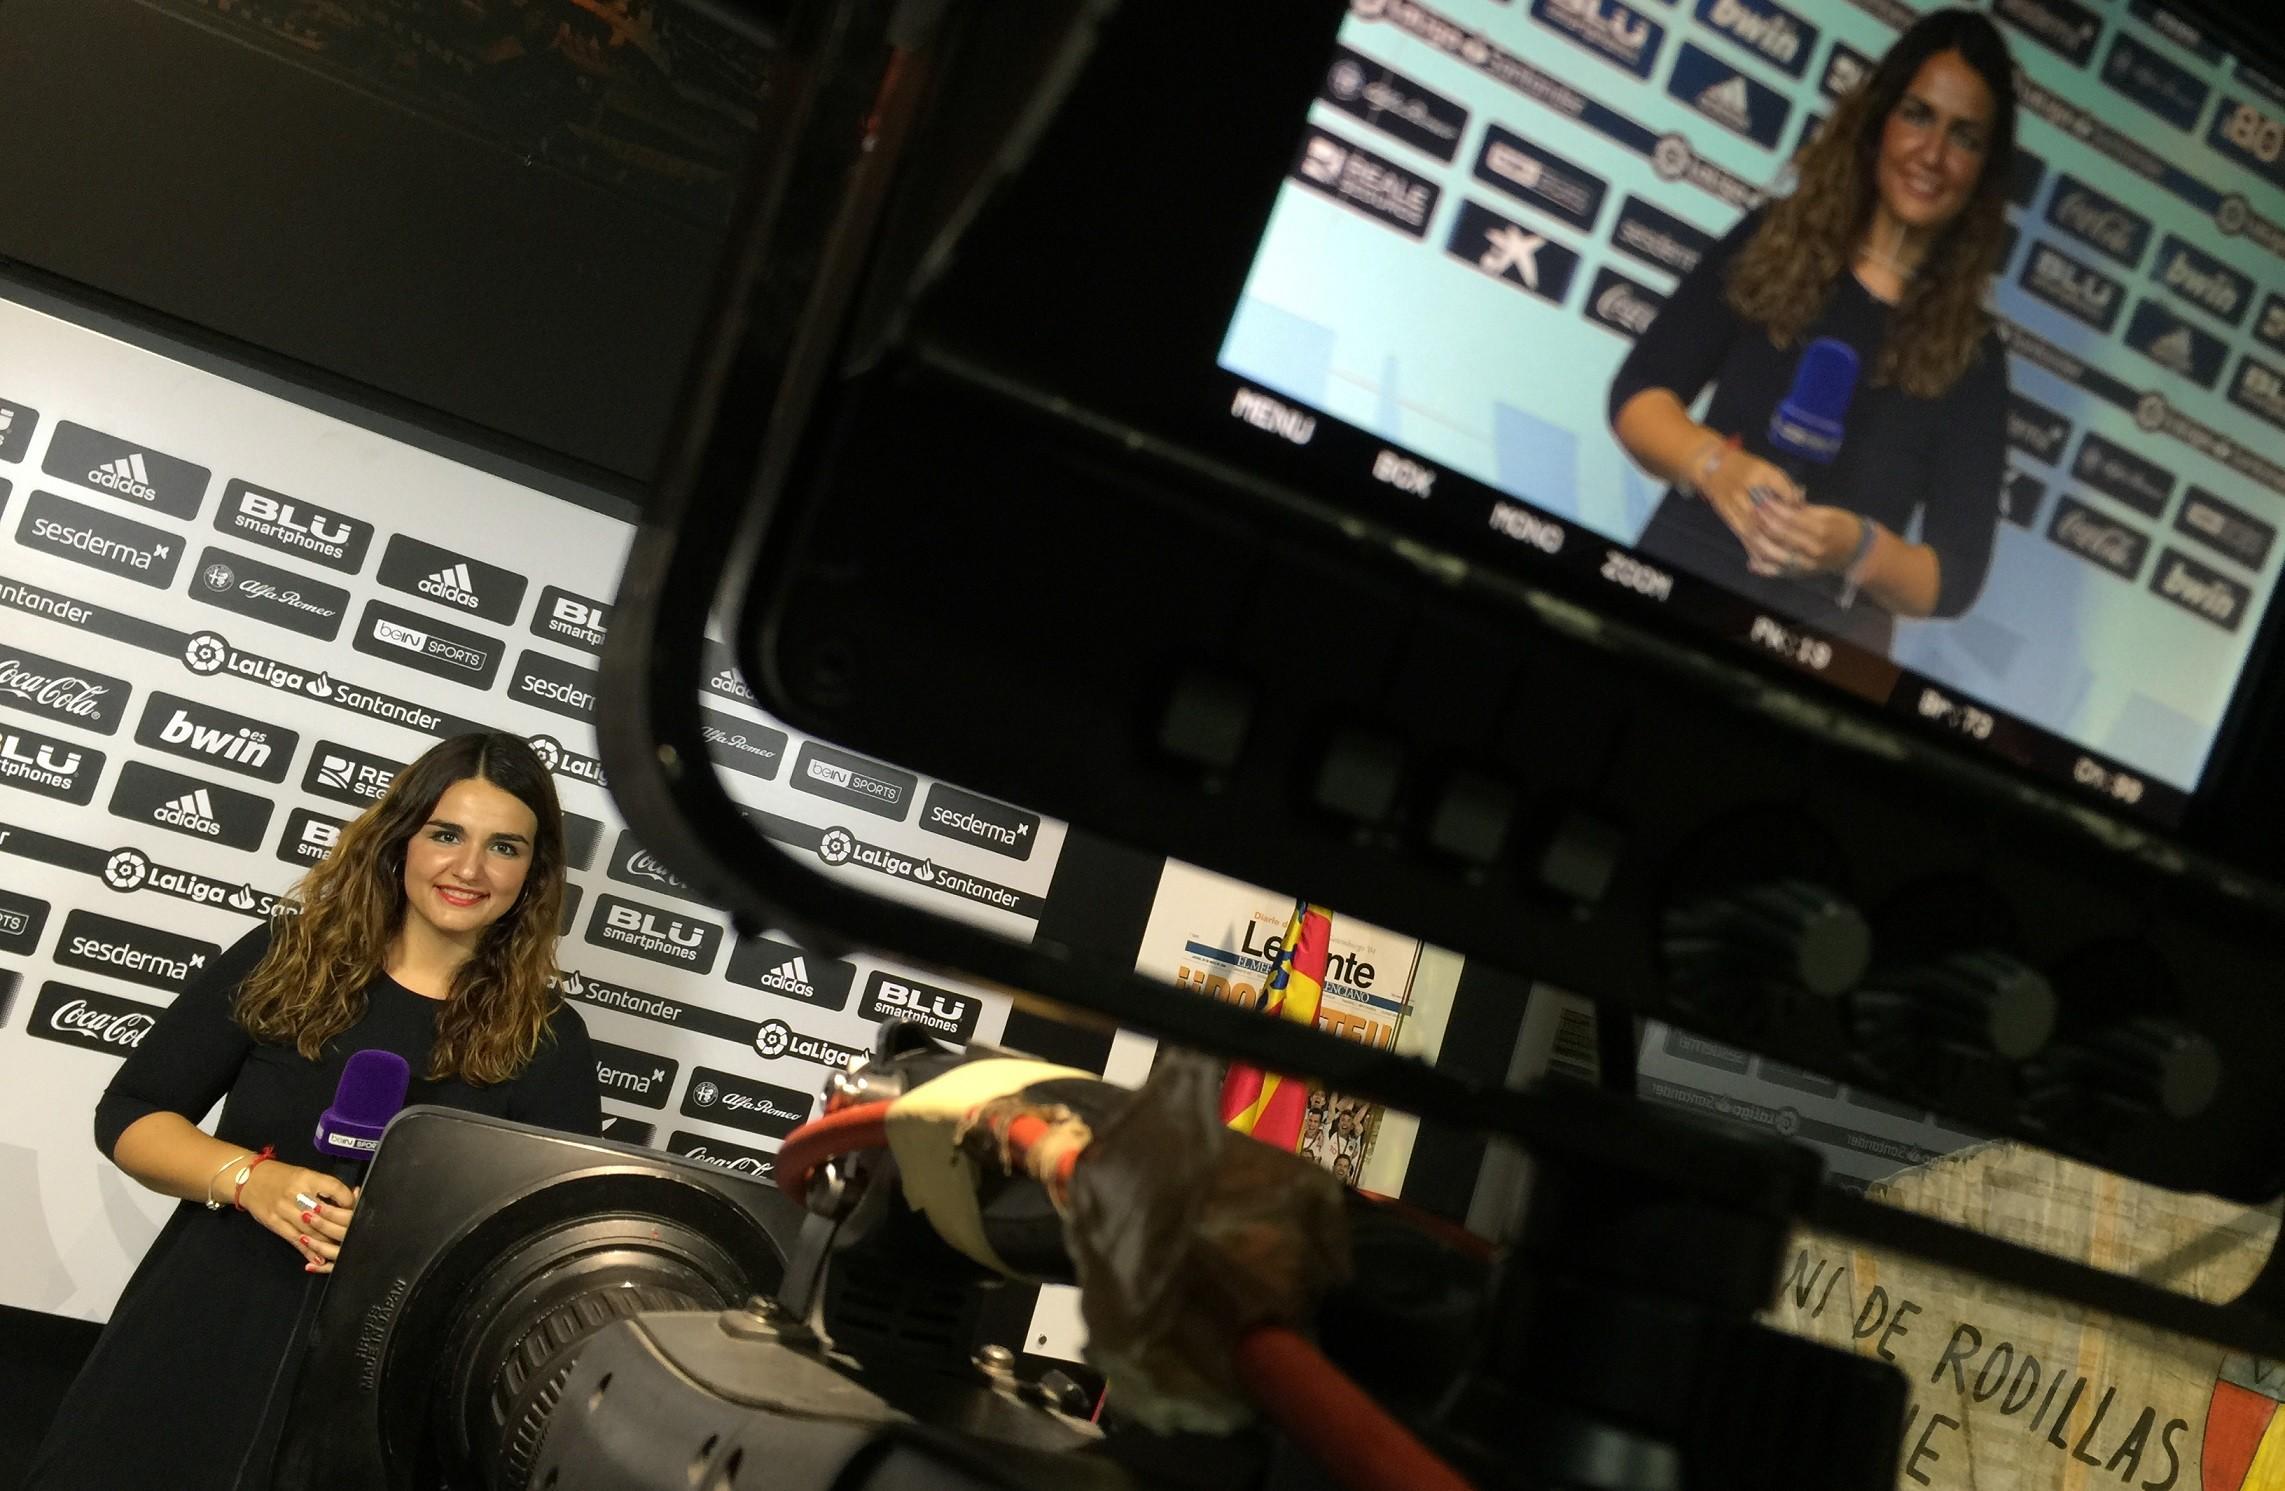 periodismo-deportivo-cristina-bea